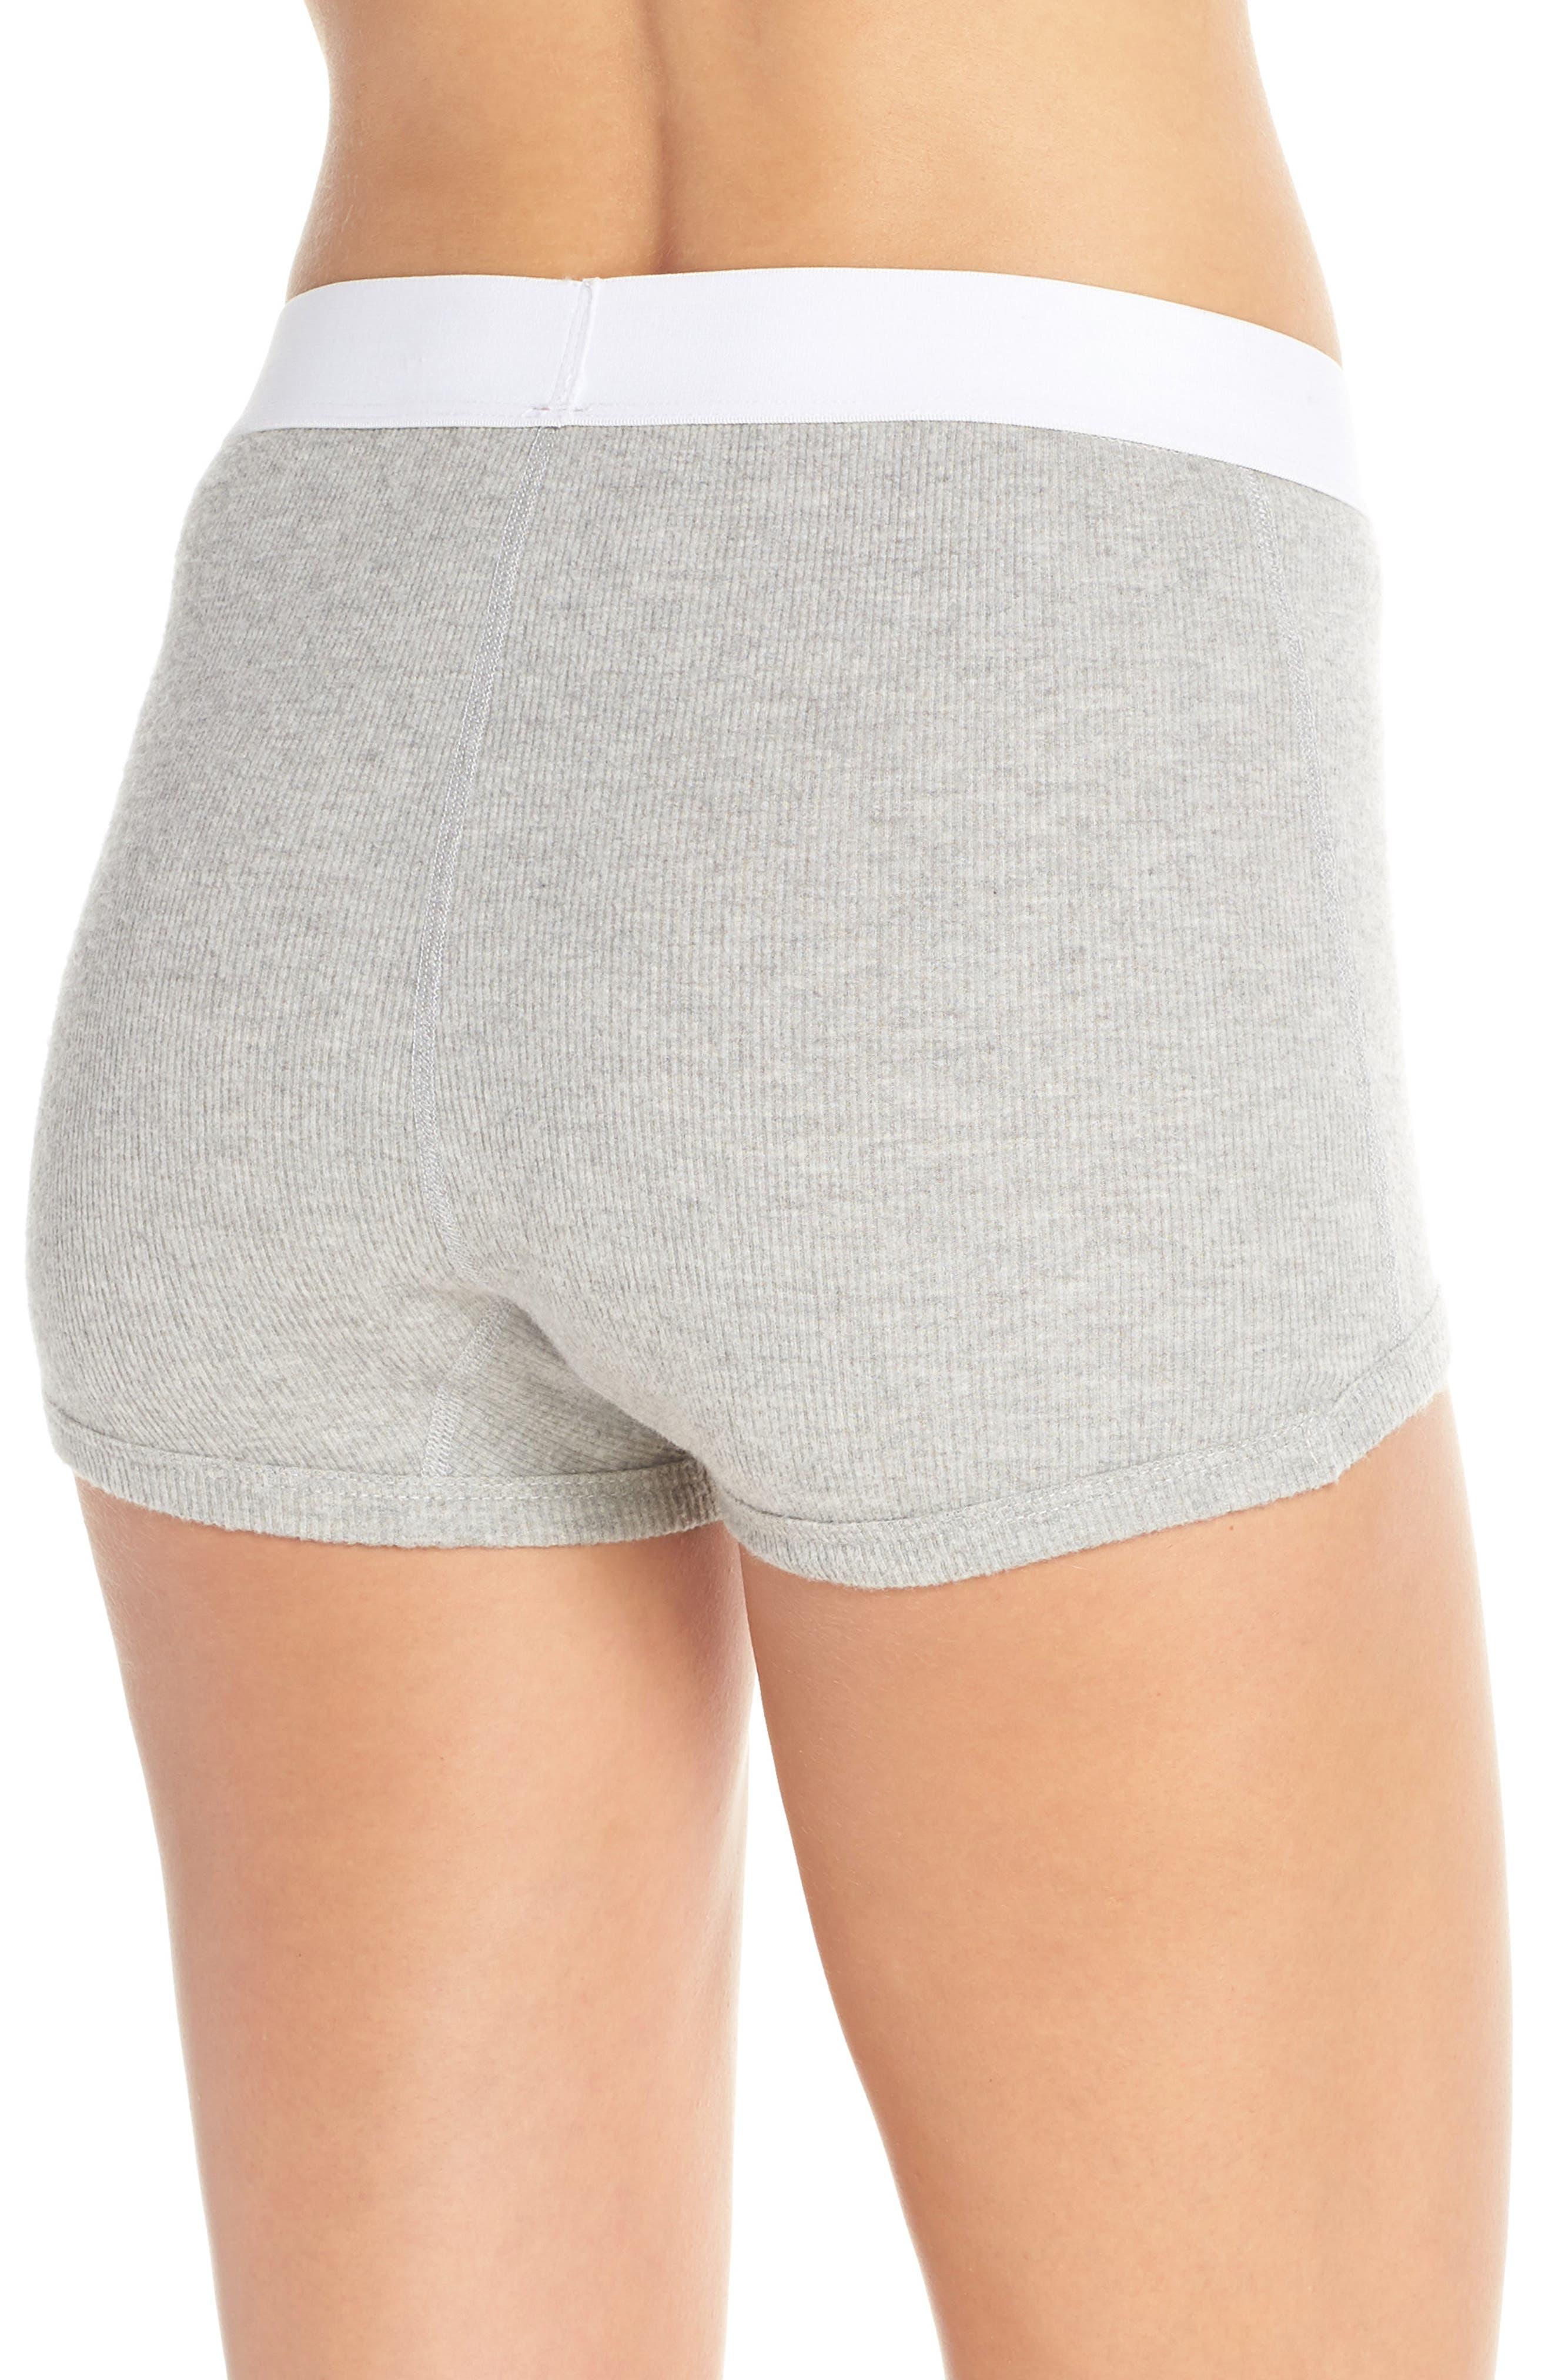 Peony Shorts,                             Alternate thumbnail 2, color,                             021